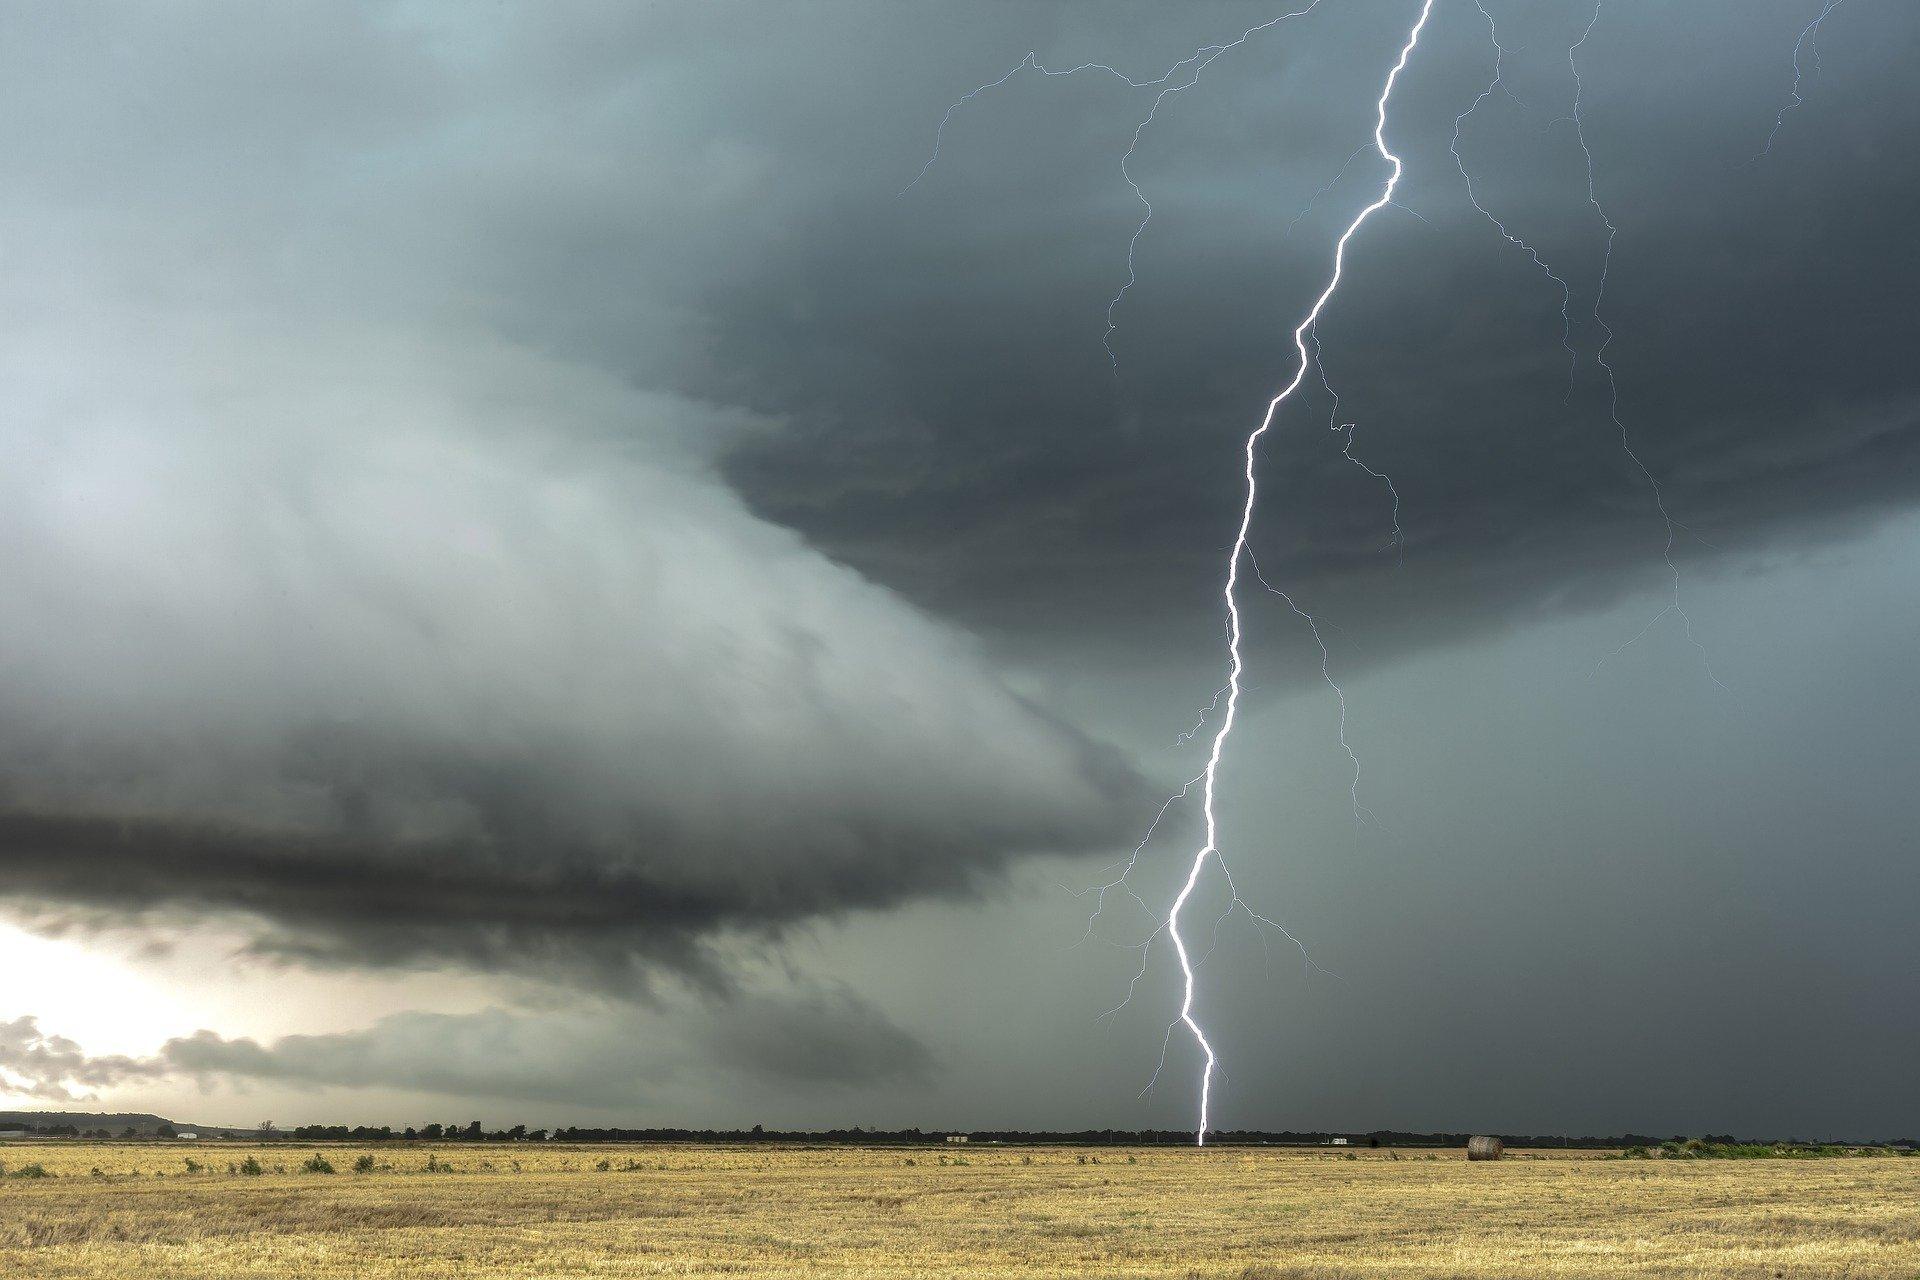 На 2 августа в Кировской области объявлено метеопредупреждение.